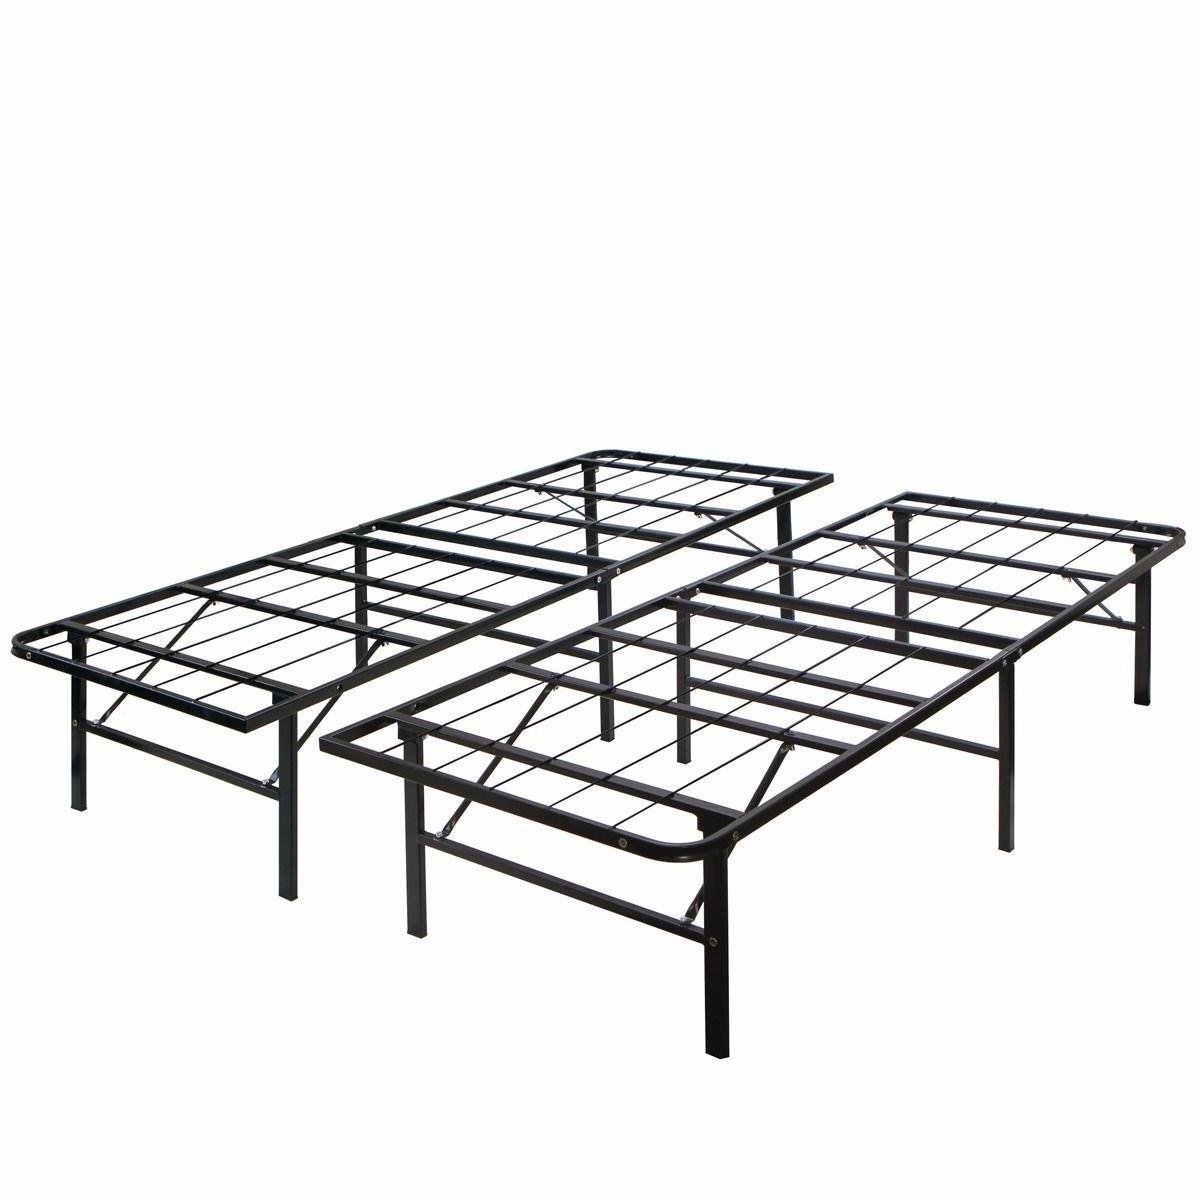 Modern King Size Bi-fold Folding Platform Metal Bed Frame Mattress Foundation